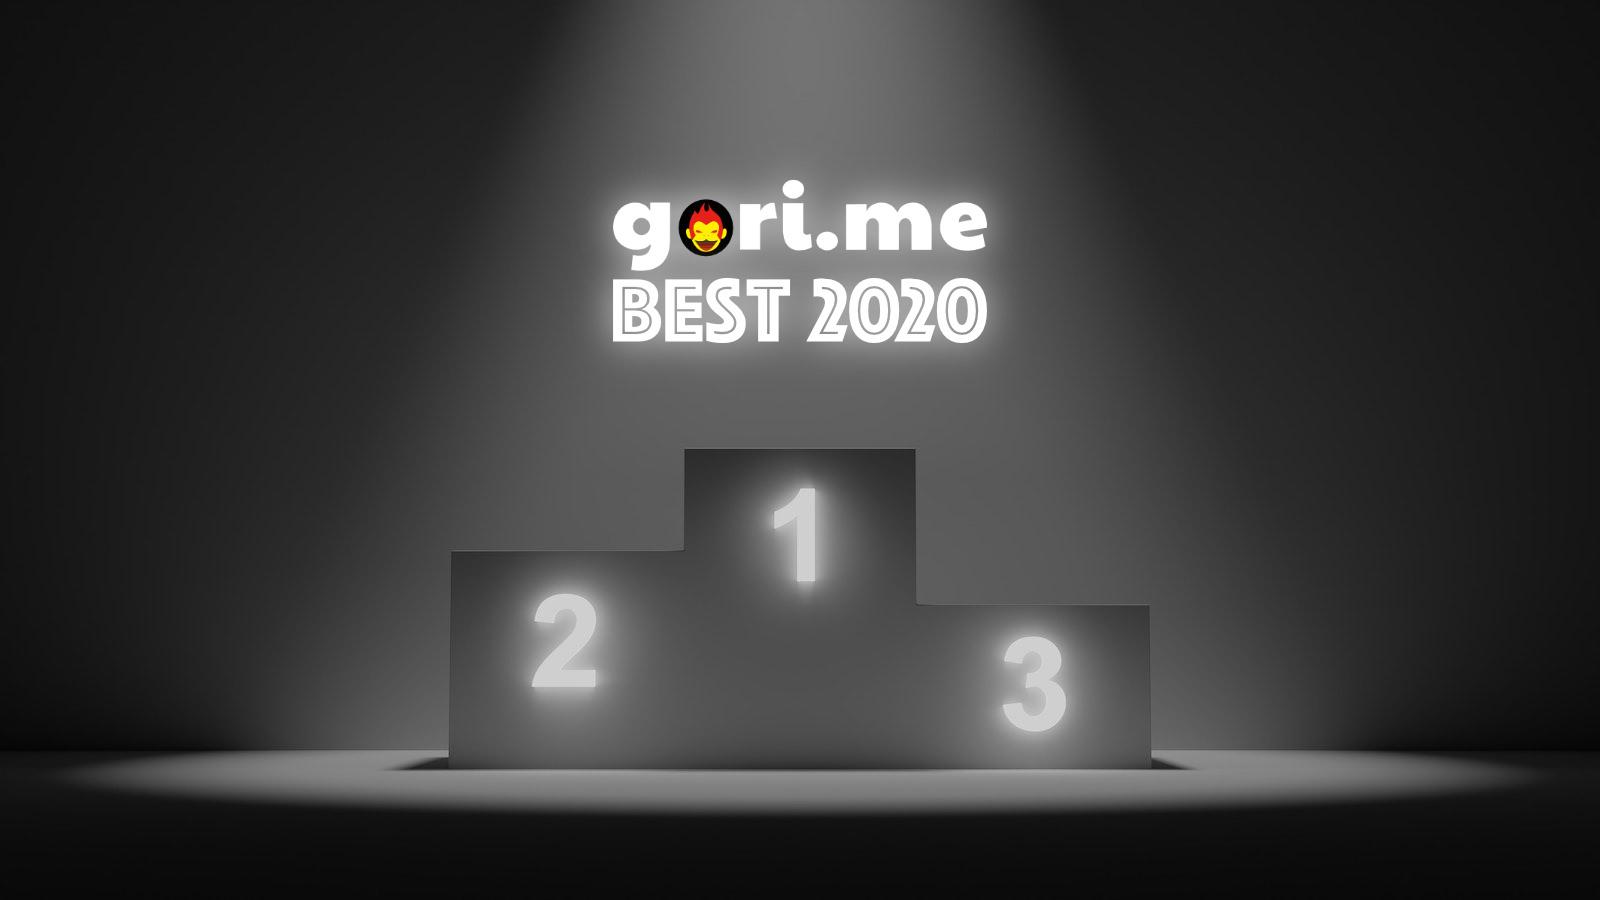 Gorime best ranking 2020